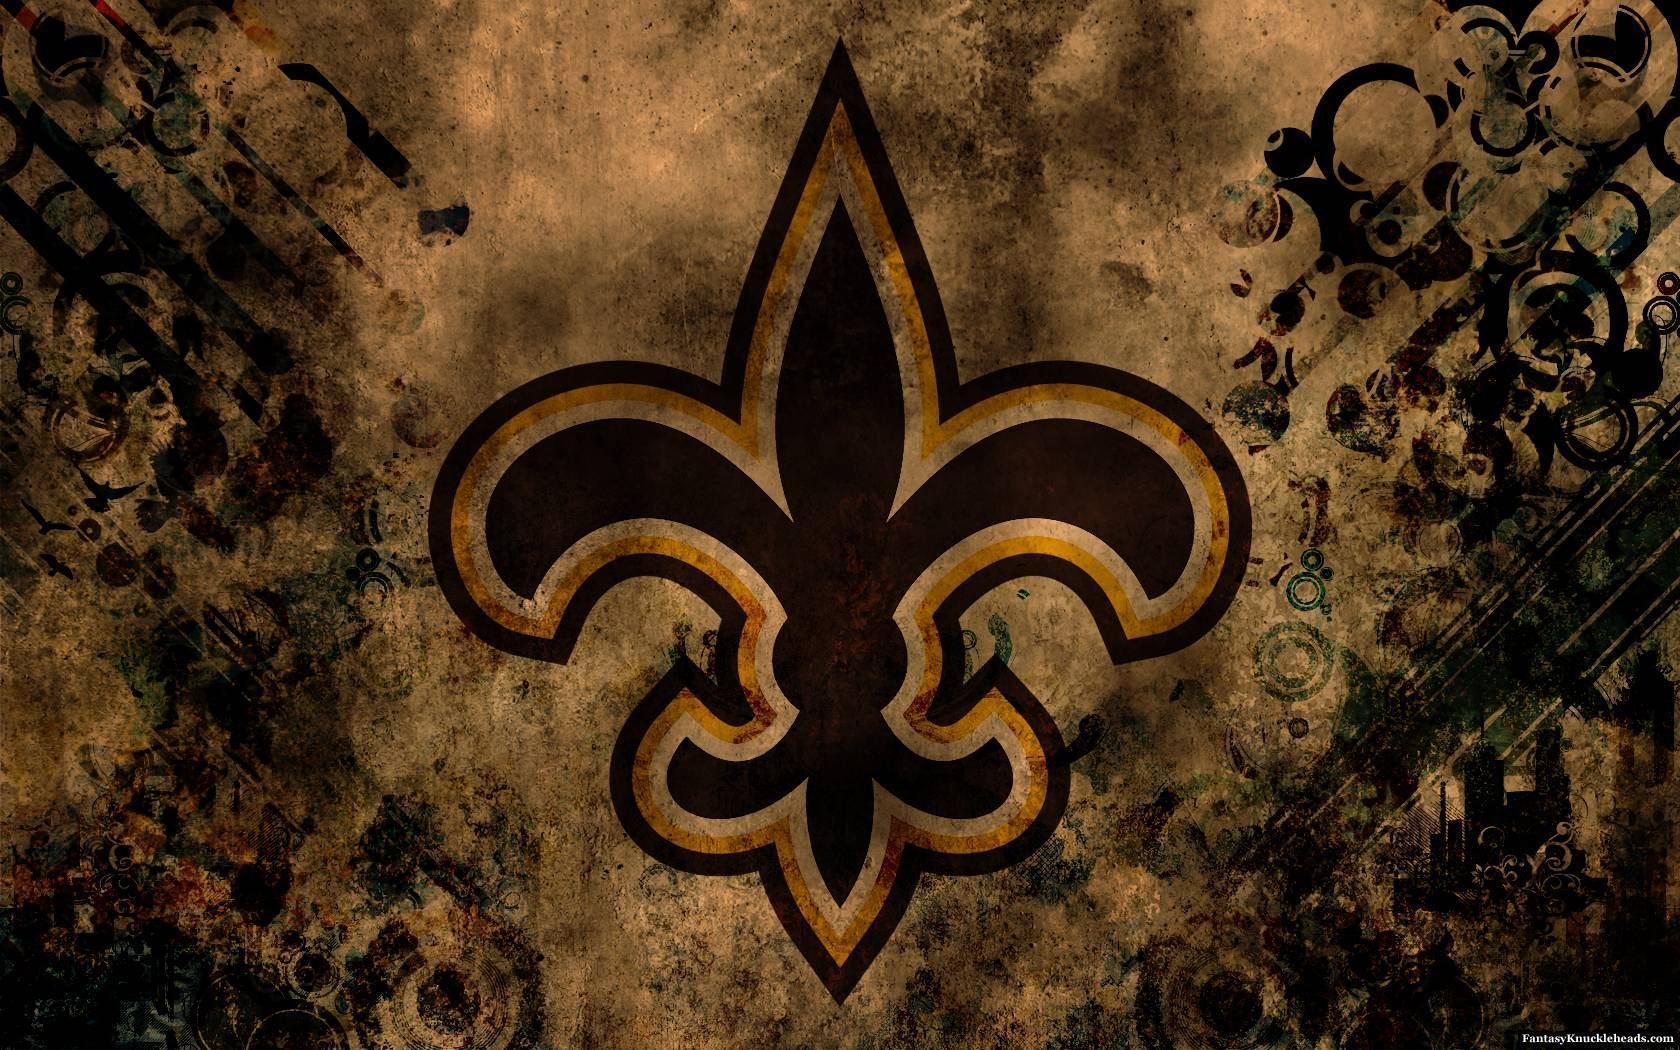 New Orleans Saints 2016 Wallpapers - Wallpaper Cave